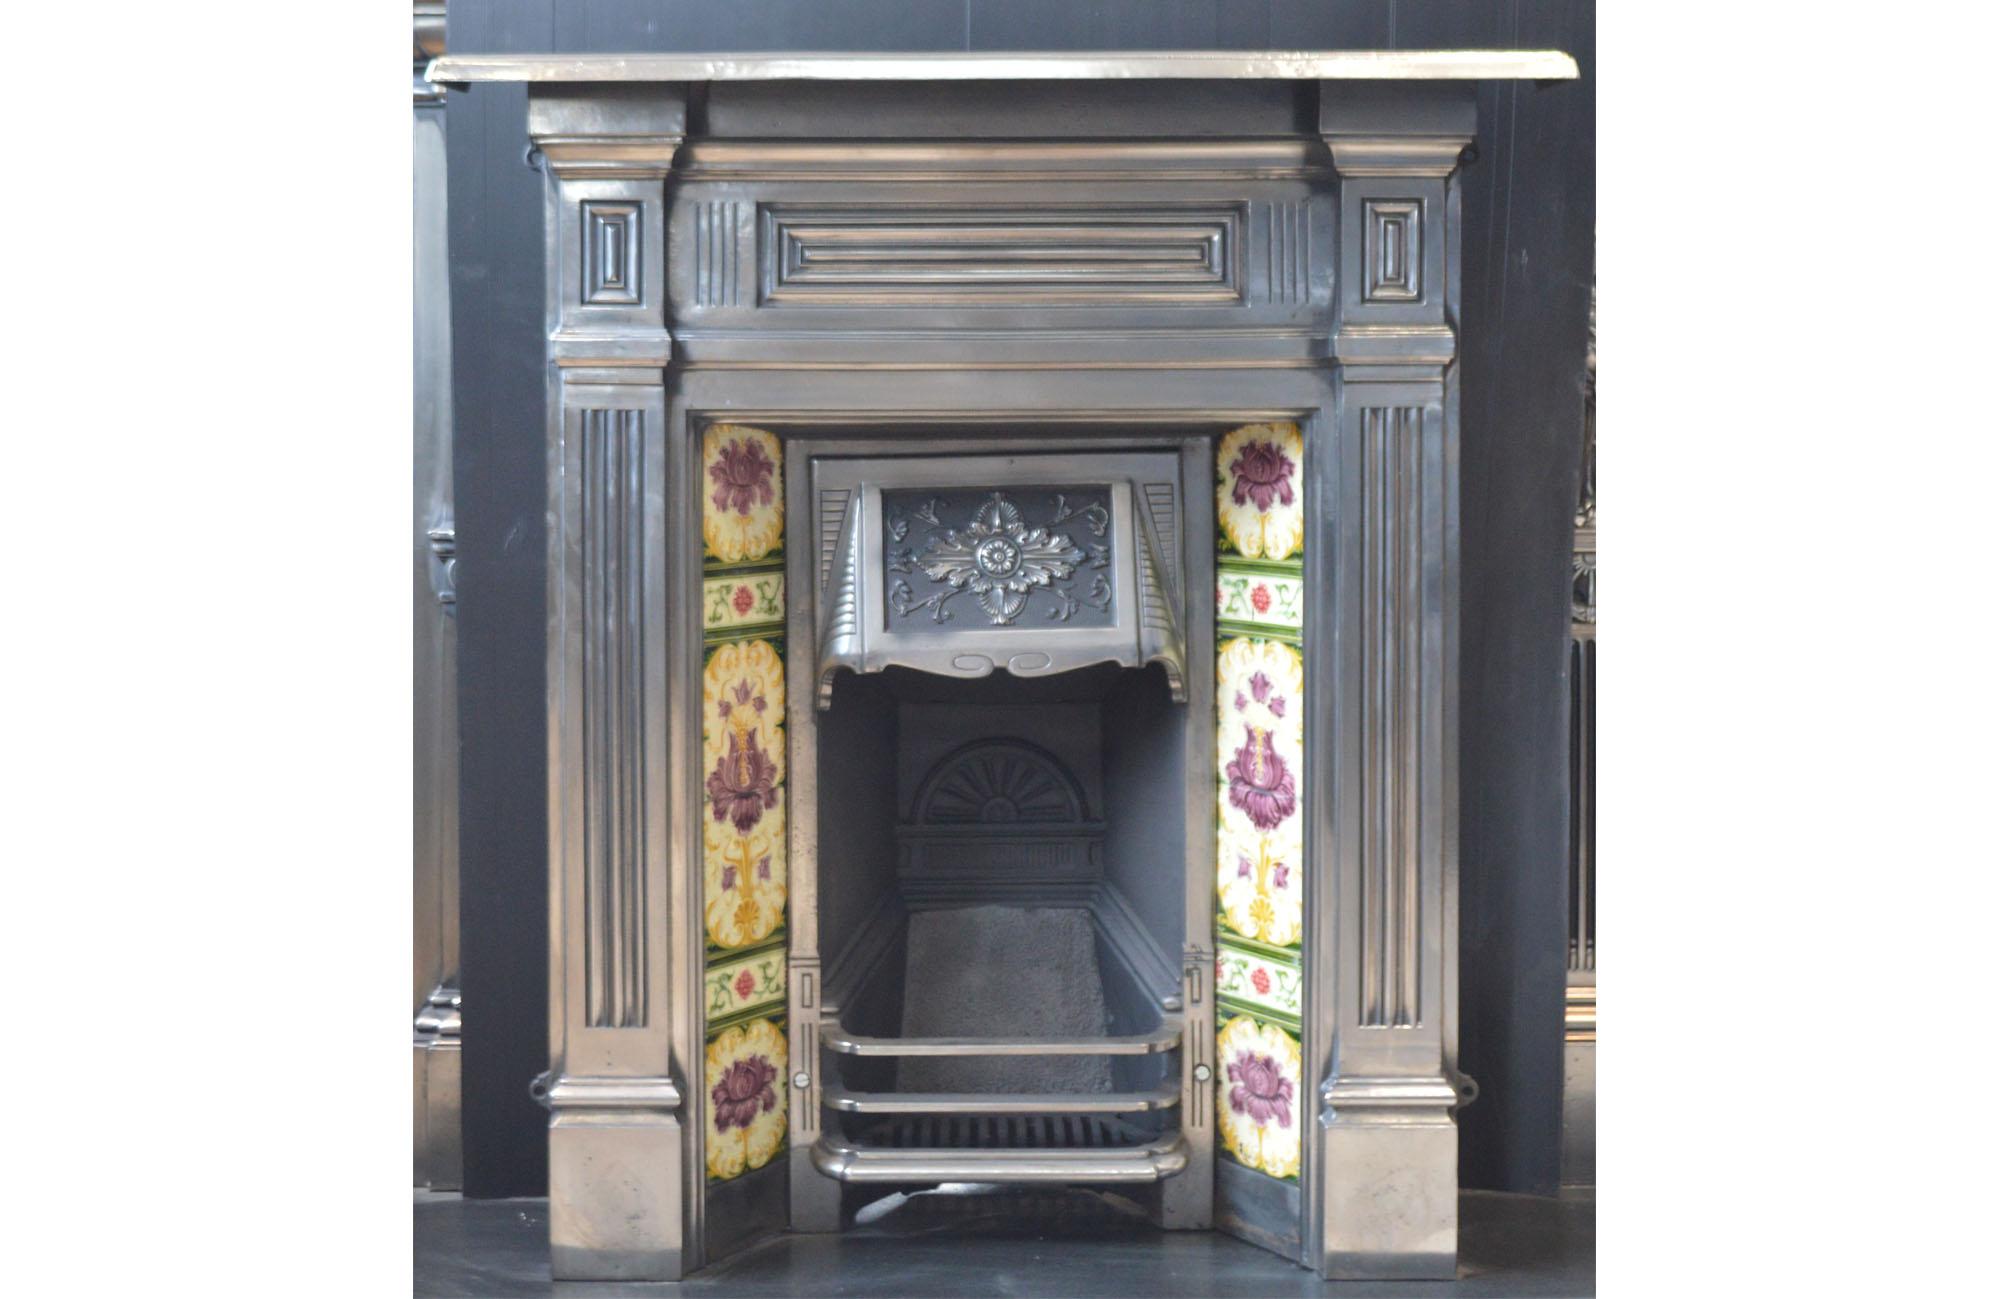 tiles edit tile antique fireplace pasadena fireplaces zabrae wisteria craftsman sm